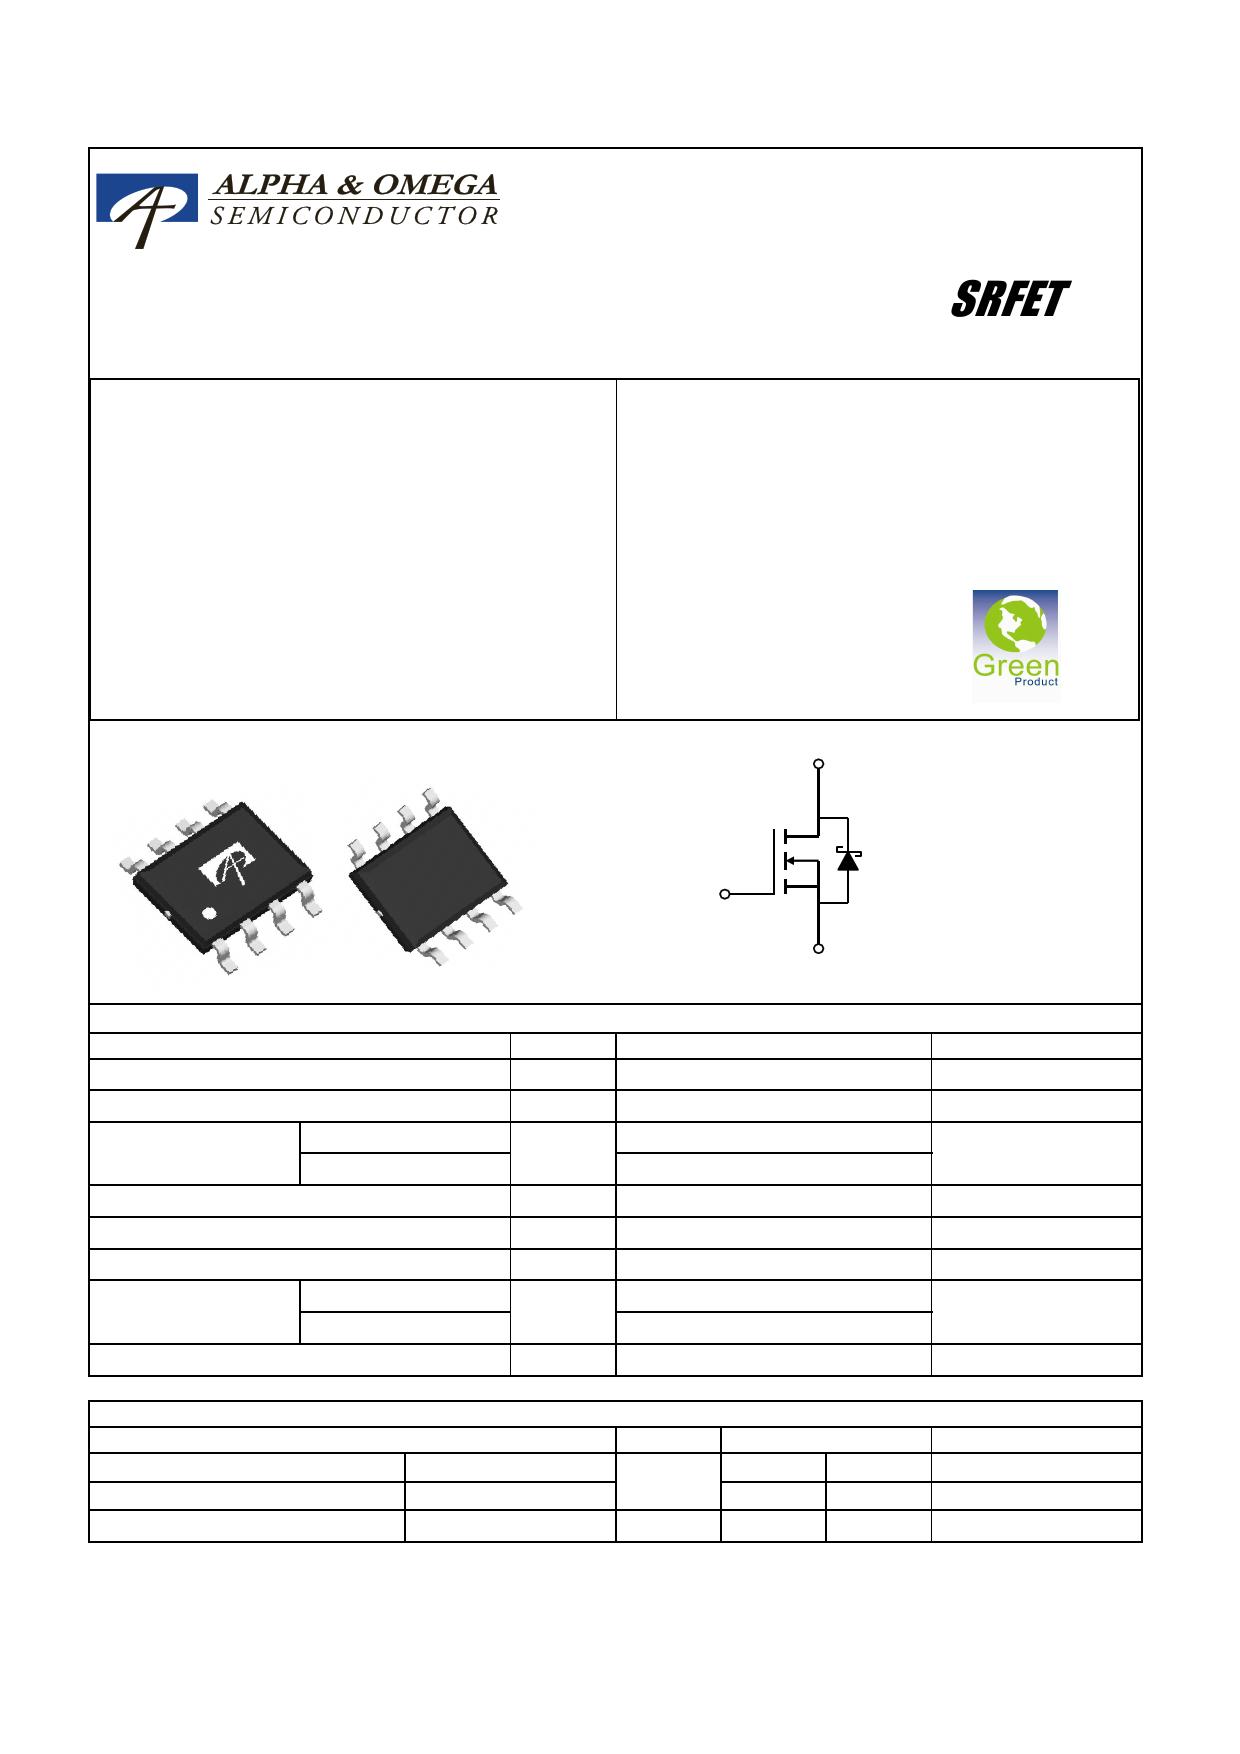 AO4708 datasheet